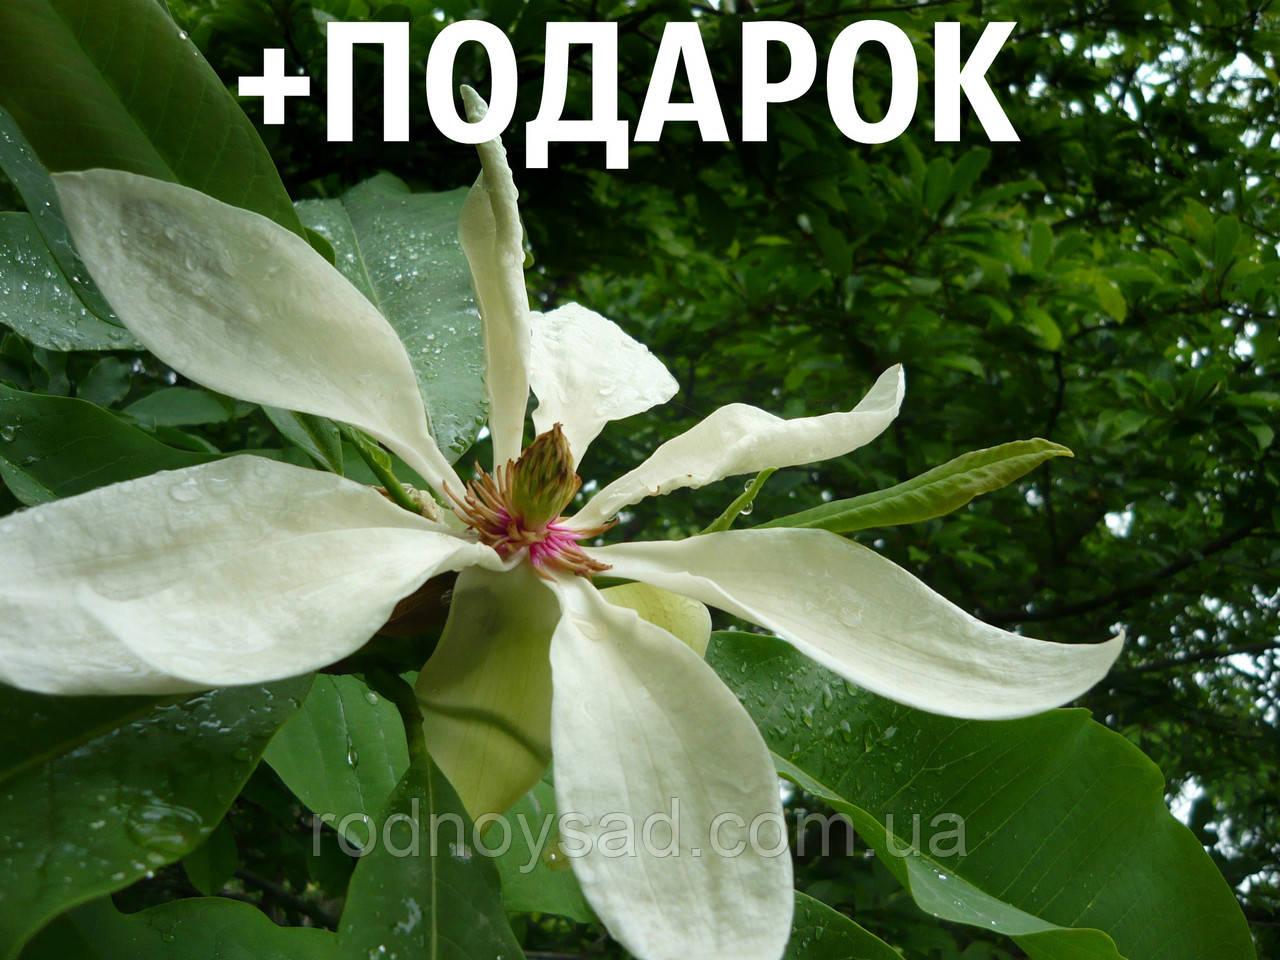 Магнолия трёхлепестная семена 10 шт (Magnolia tripetala) для саженцев насіння магнолія на саджанці